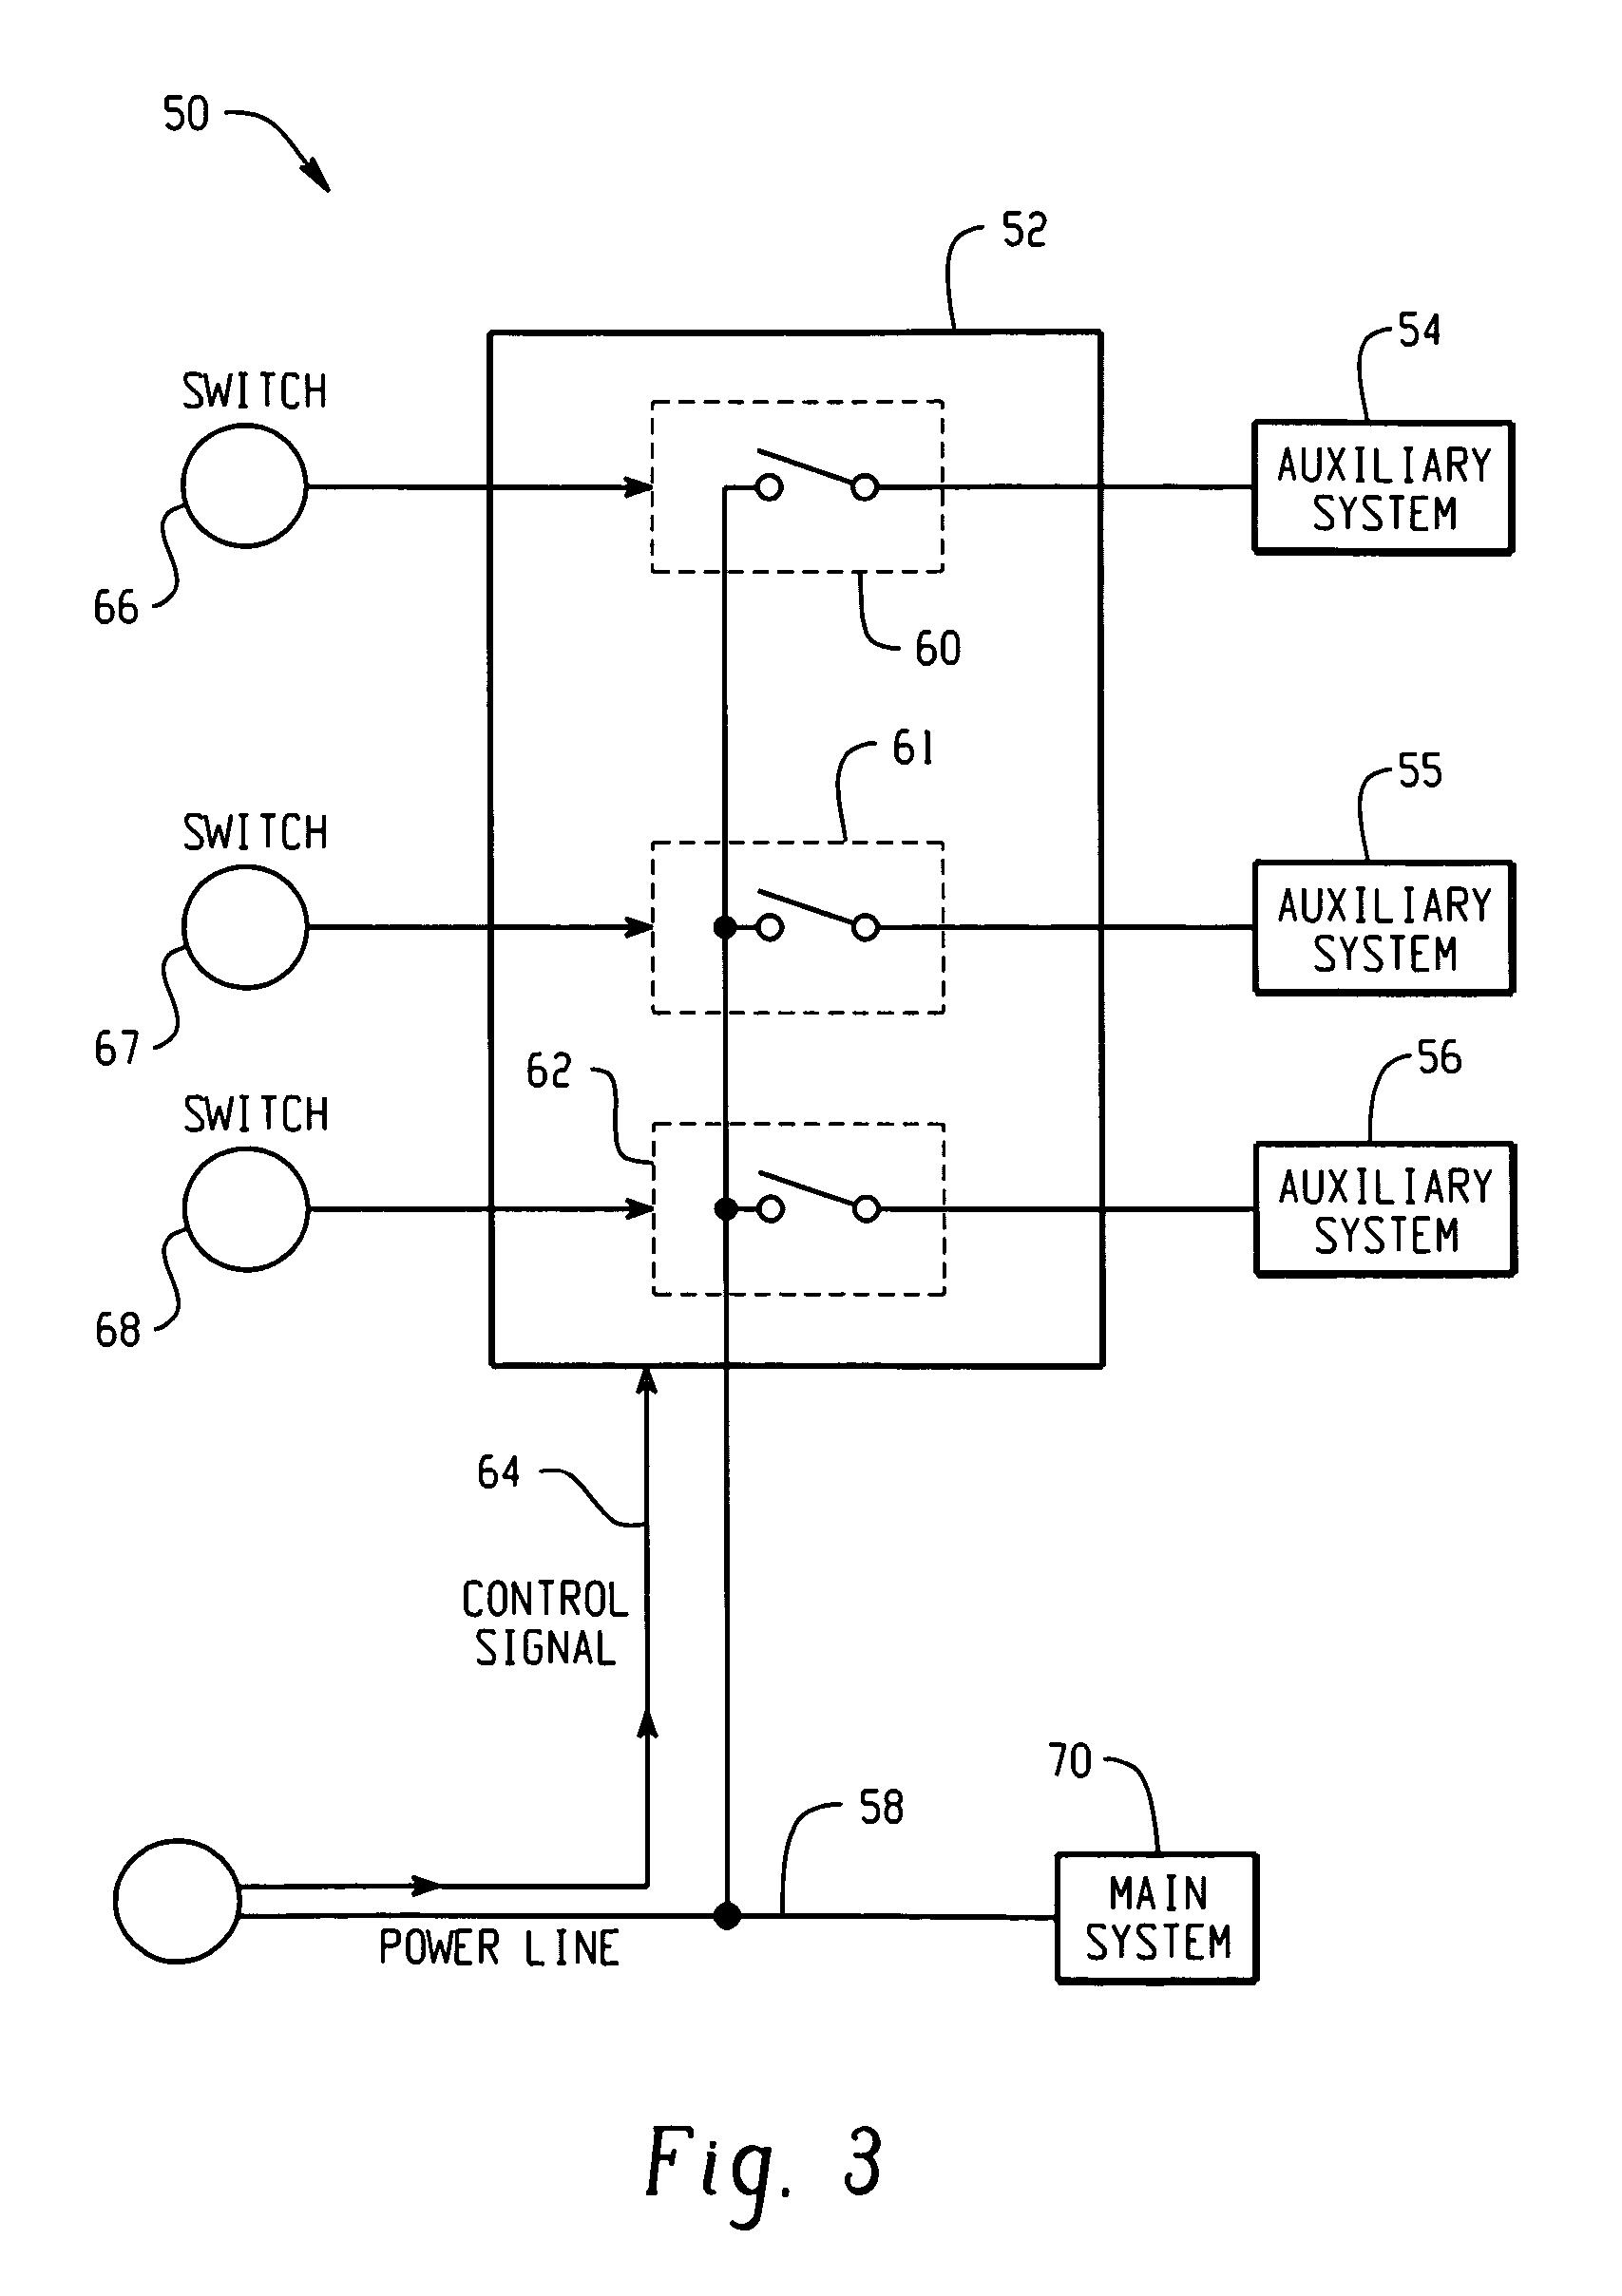 phillips sae j560 wiring diagram j plug wiring diagram ... on